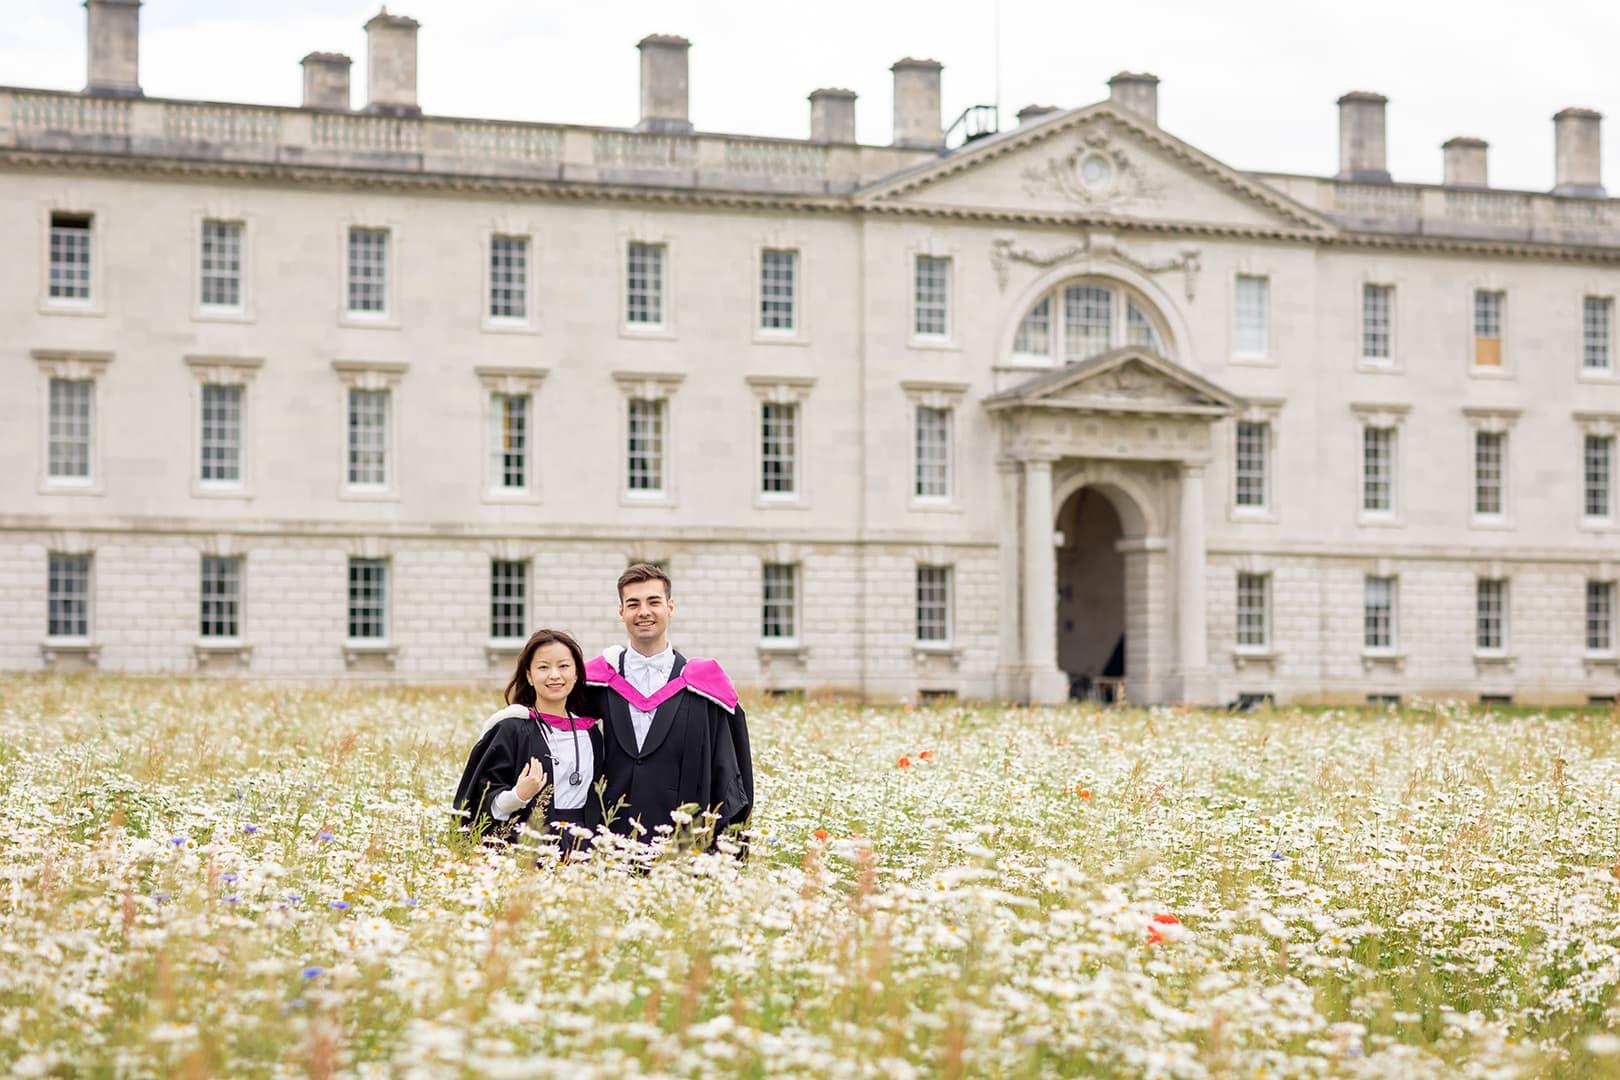 Graduation photoshoot at Senate House Cambridge